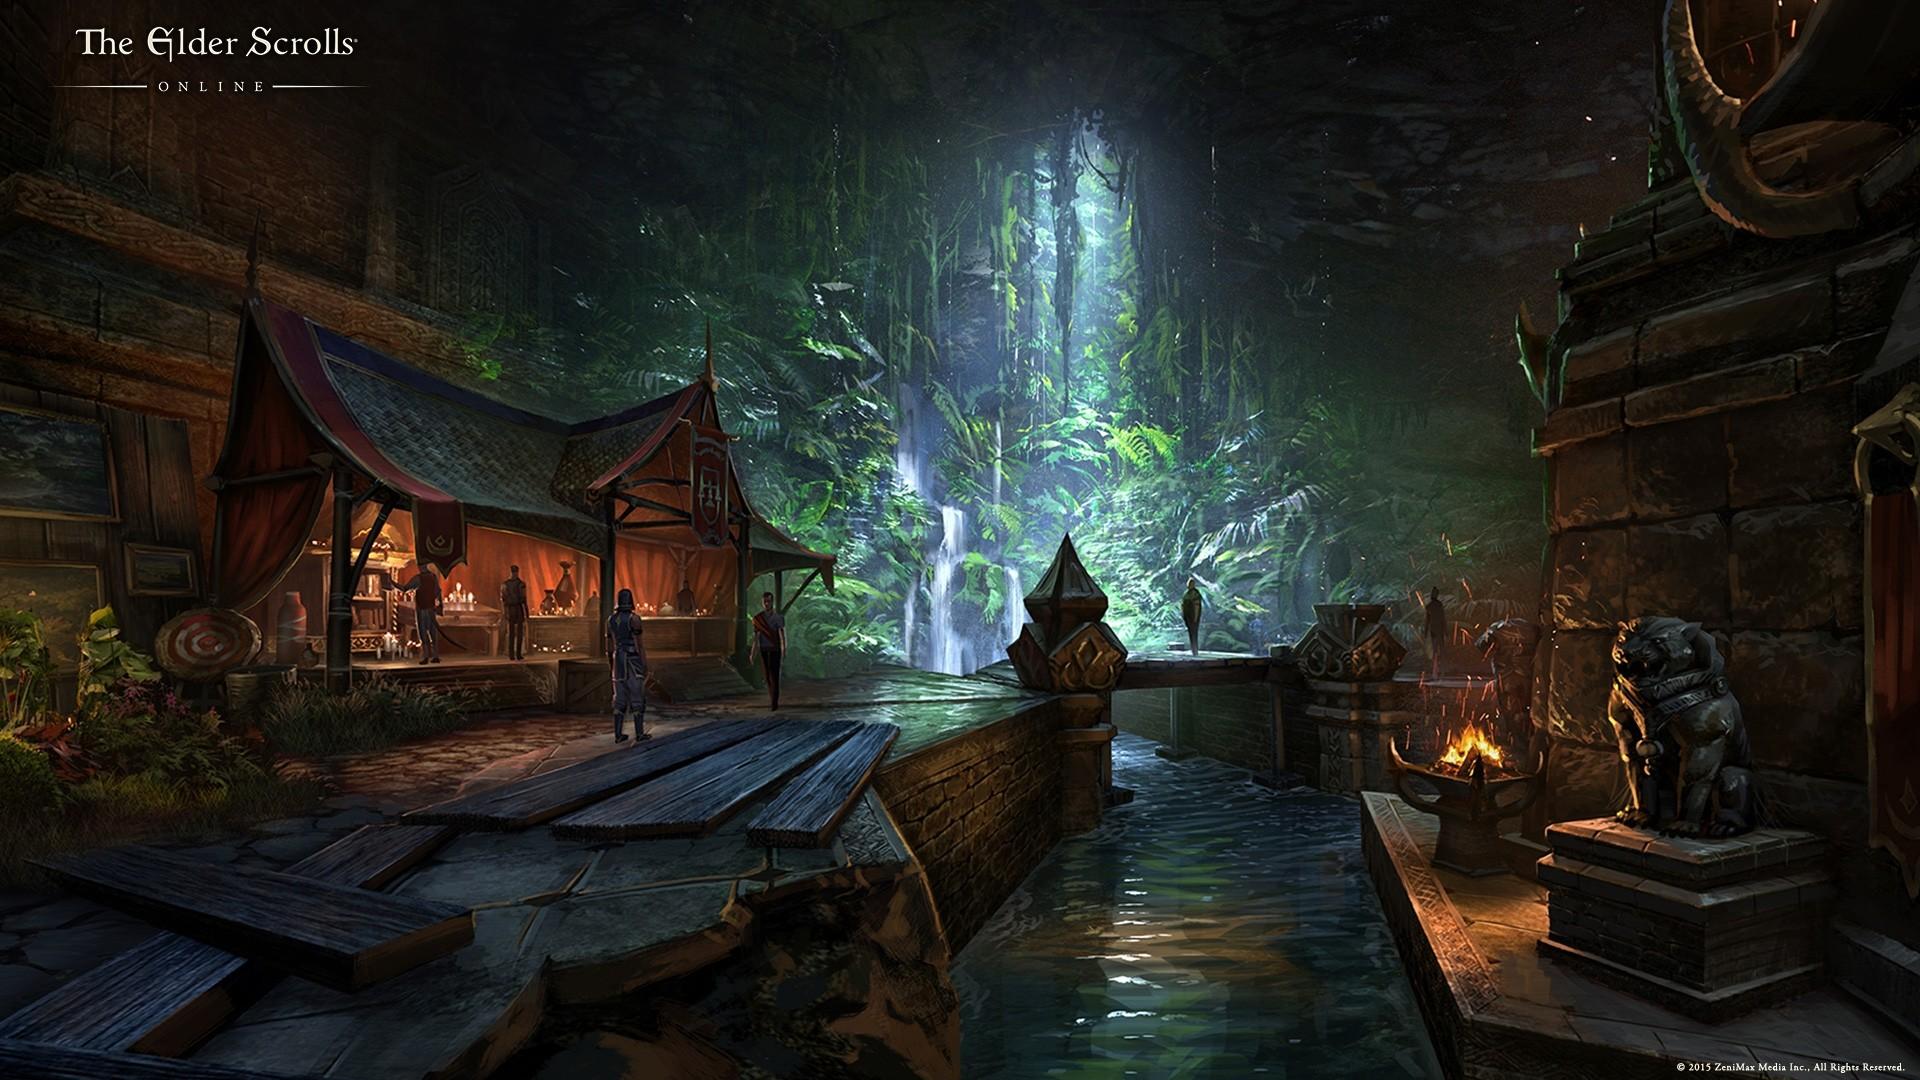 Elder Scrolls Wallpaper theme